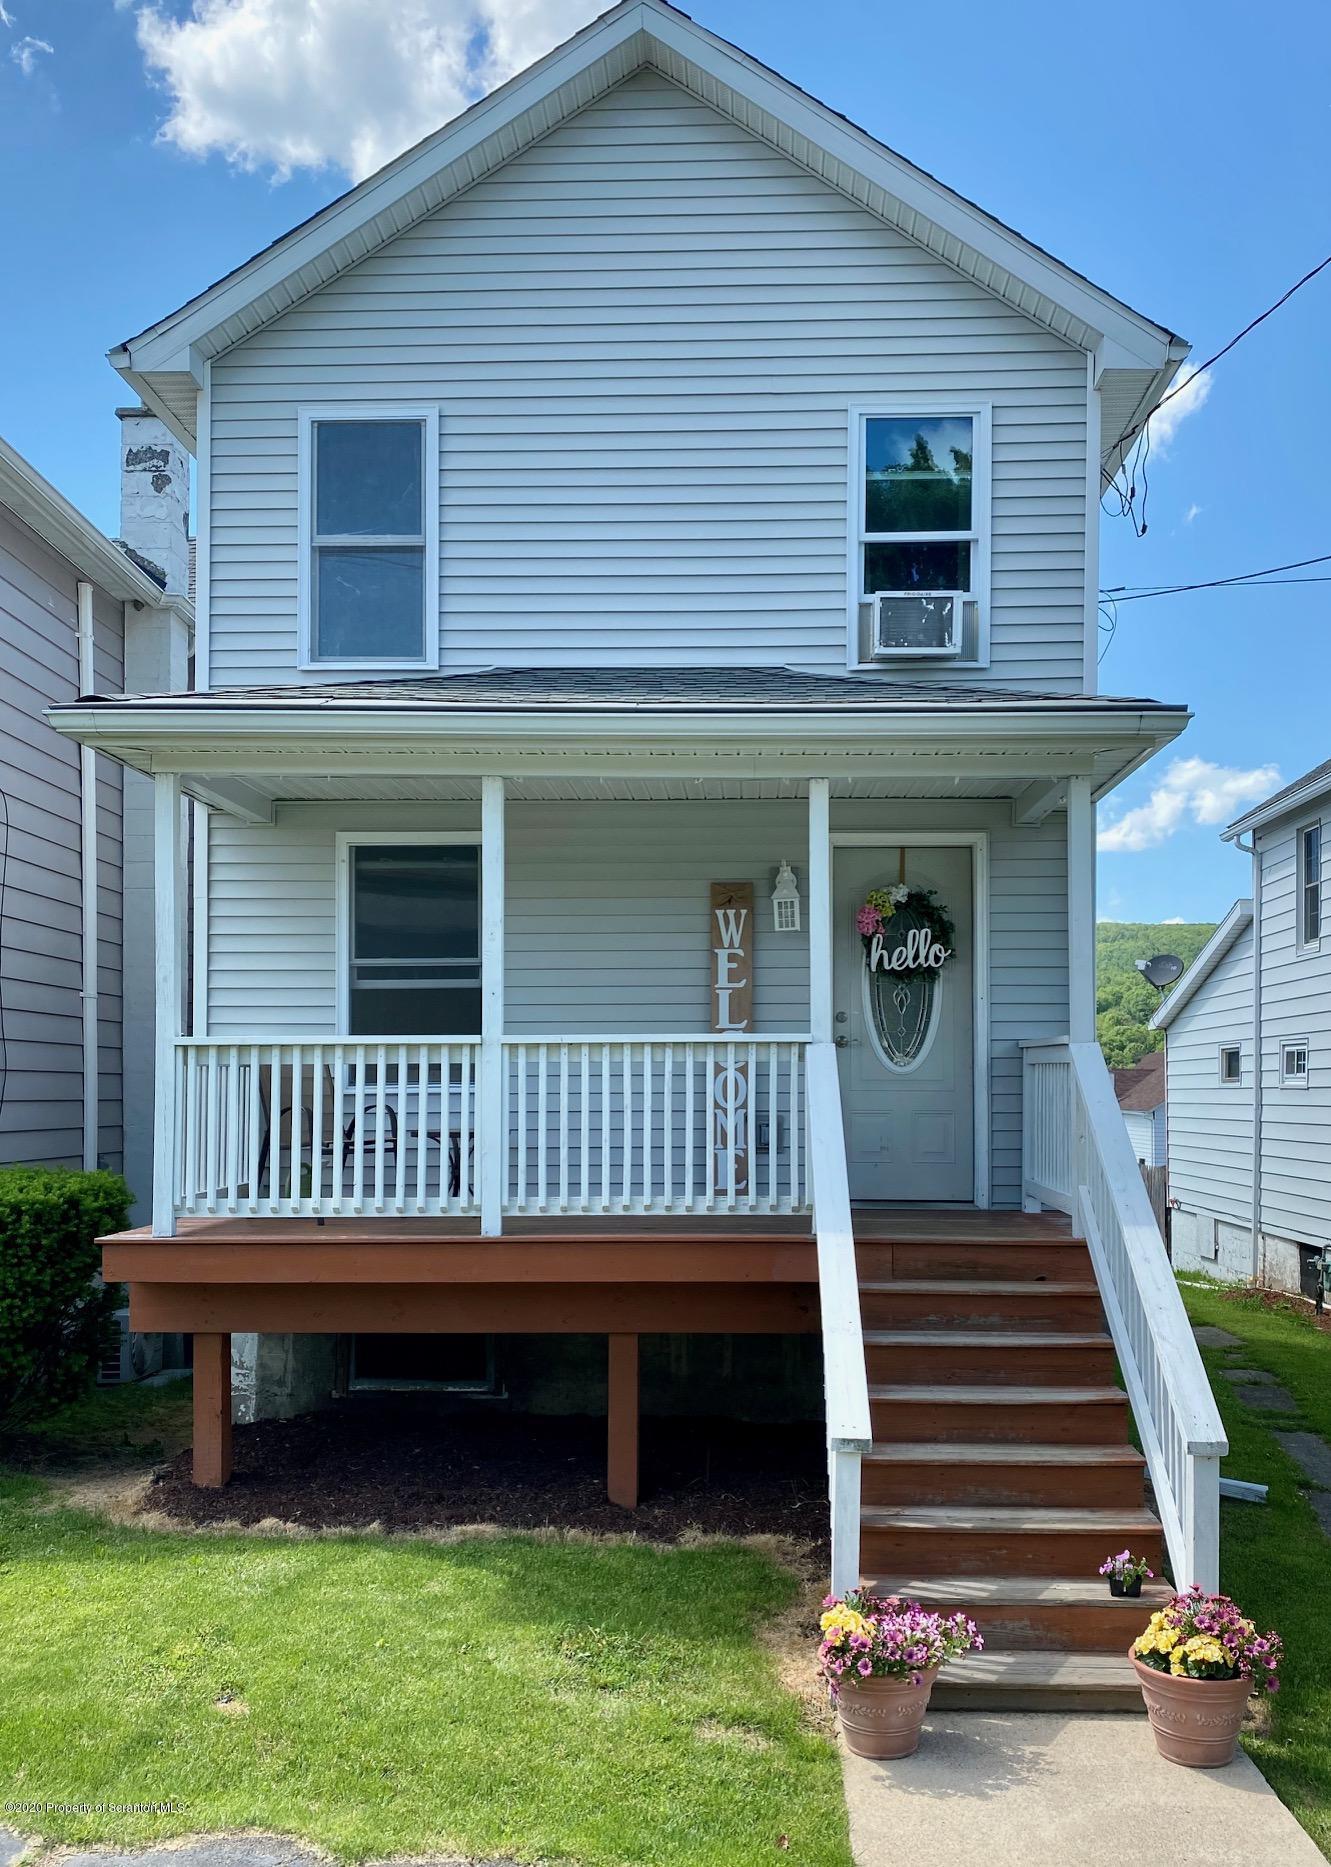 417 Delaware St, Mayfield, Pennsylvania 18433, 2 Bedrooms Bedrooms, 5 Rooms Rooms,1 BathroomBathrooms,Single Family,For Sale,Delaware,20-1944